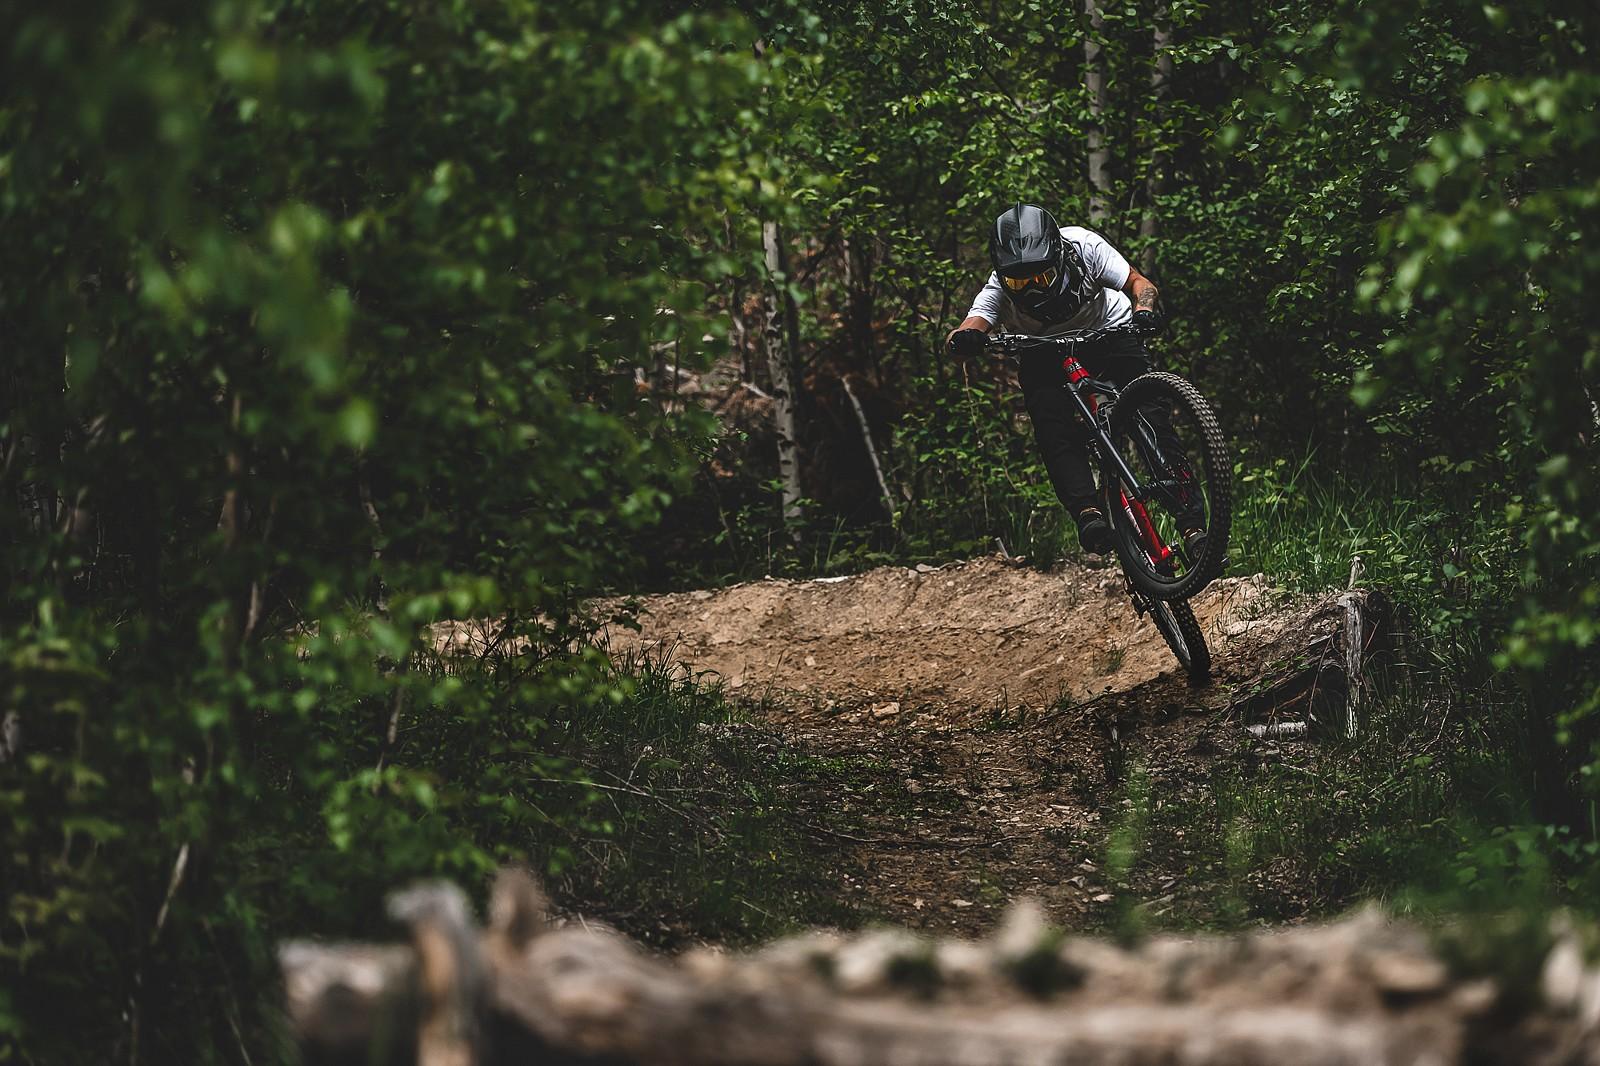 berm - Banan - Mountain Biking Pictures - Vital MTB